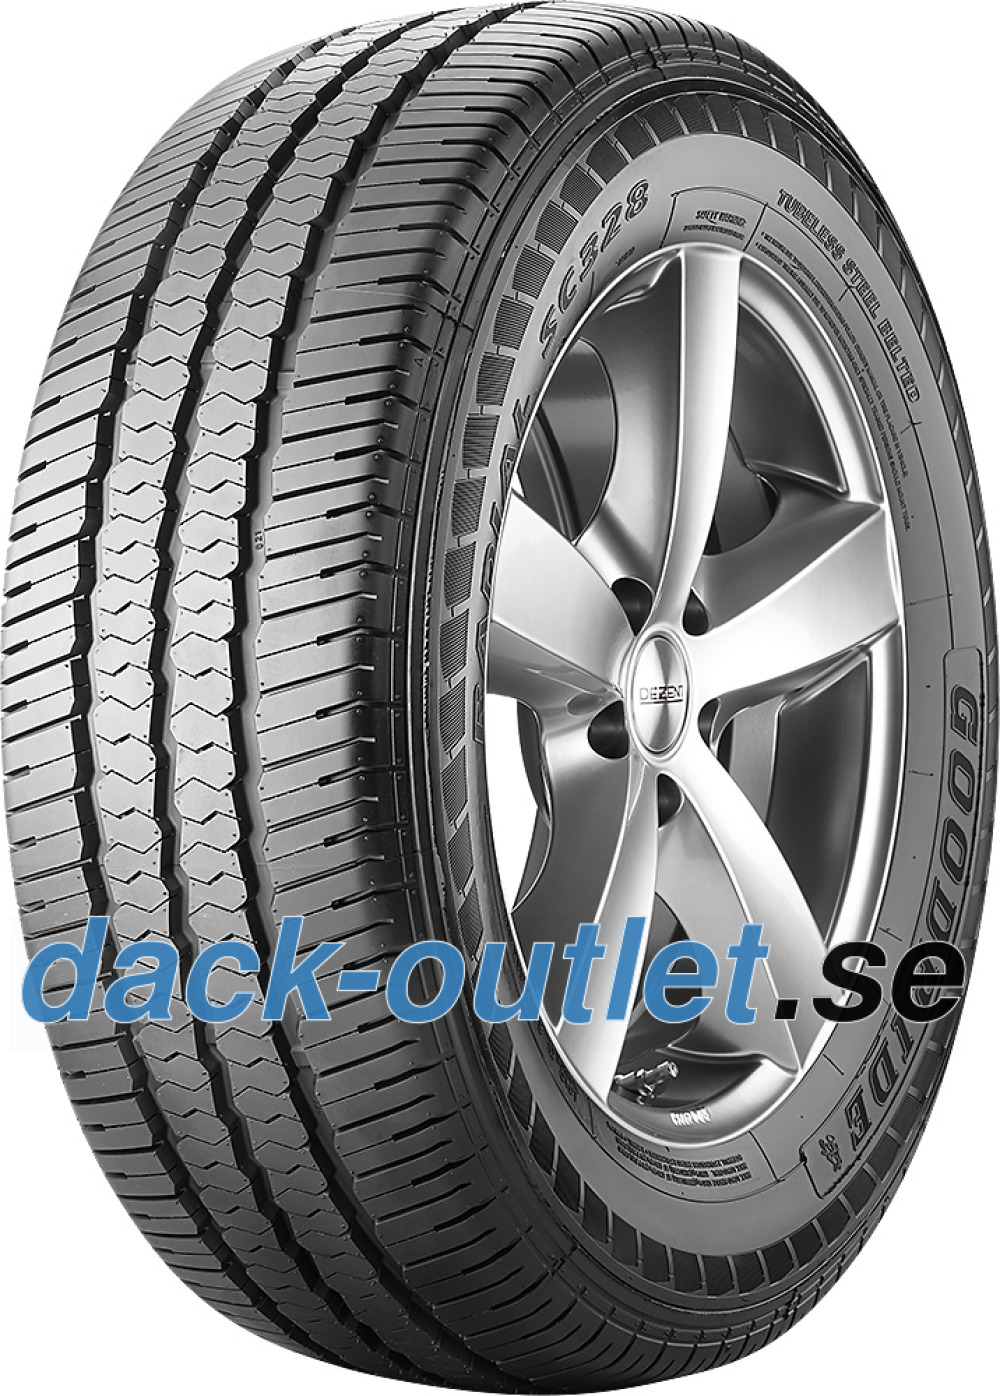 Goodride SC328 Radial ( 225/70 R15C 112/110R 8PR )